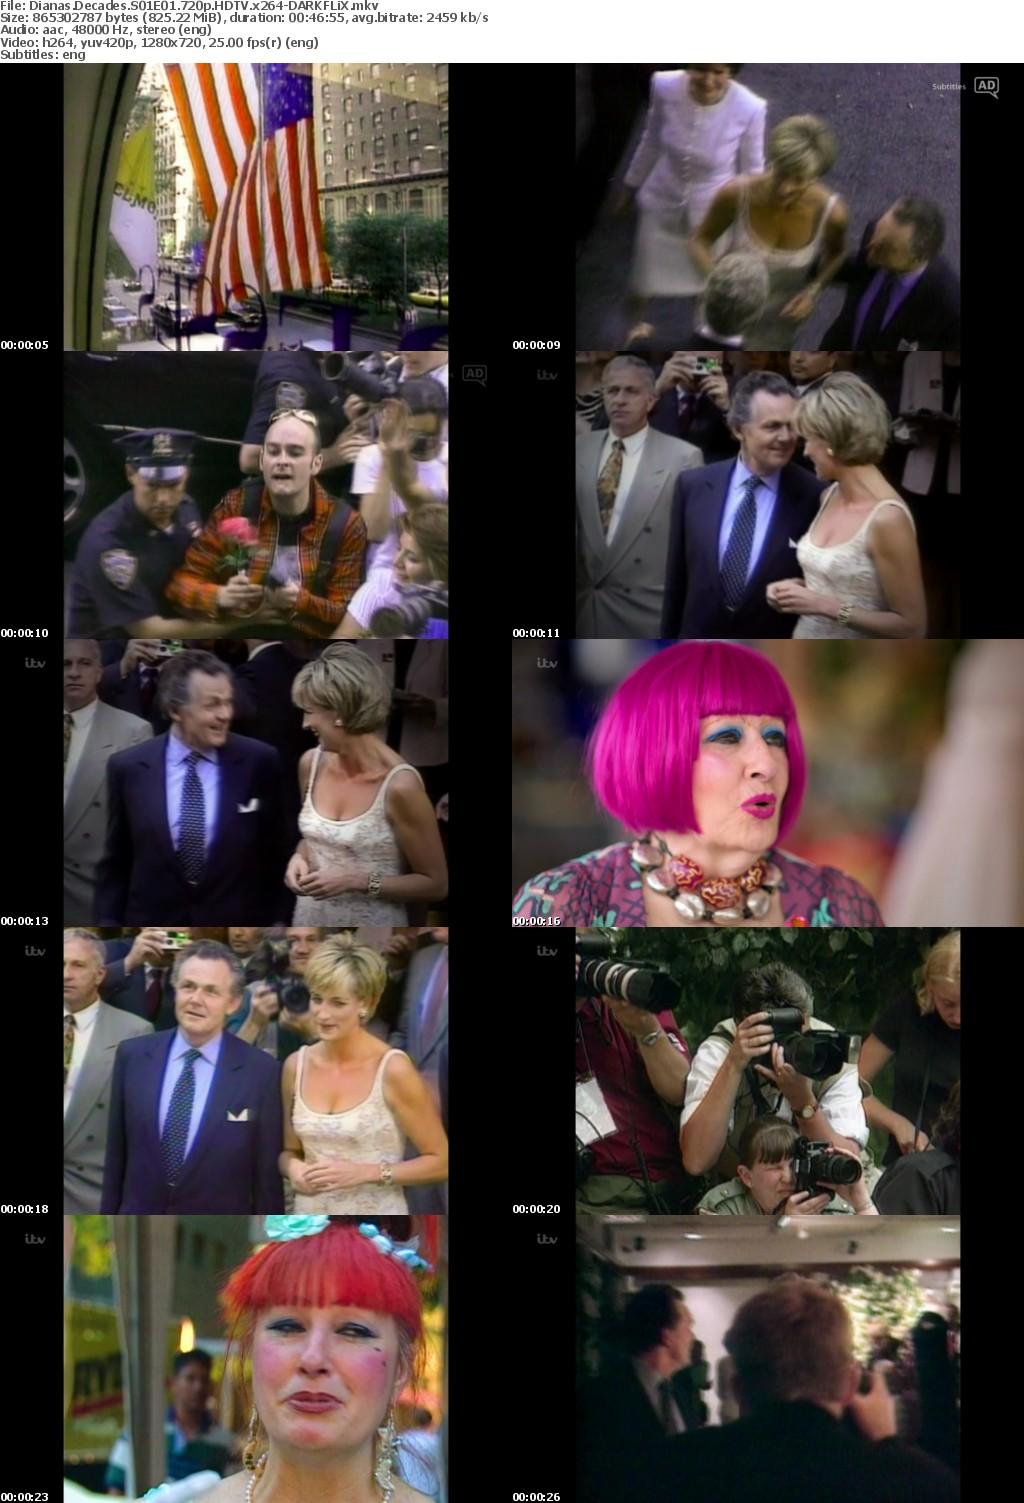 Dianas Decades S01E01 720p HDTV x264-DARKFLiX